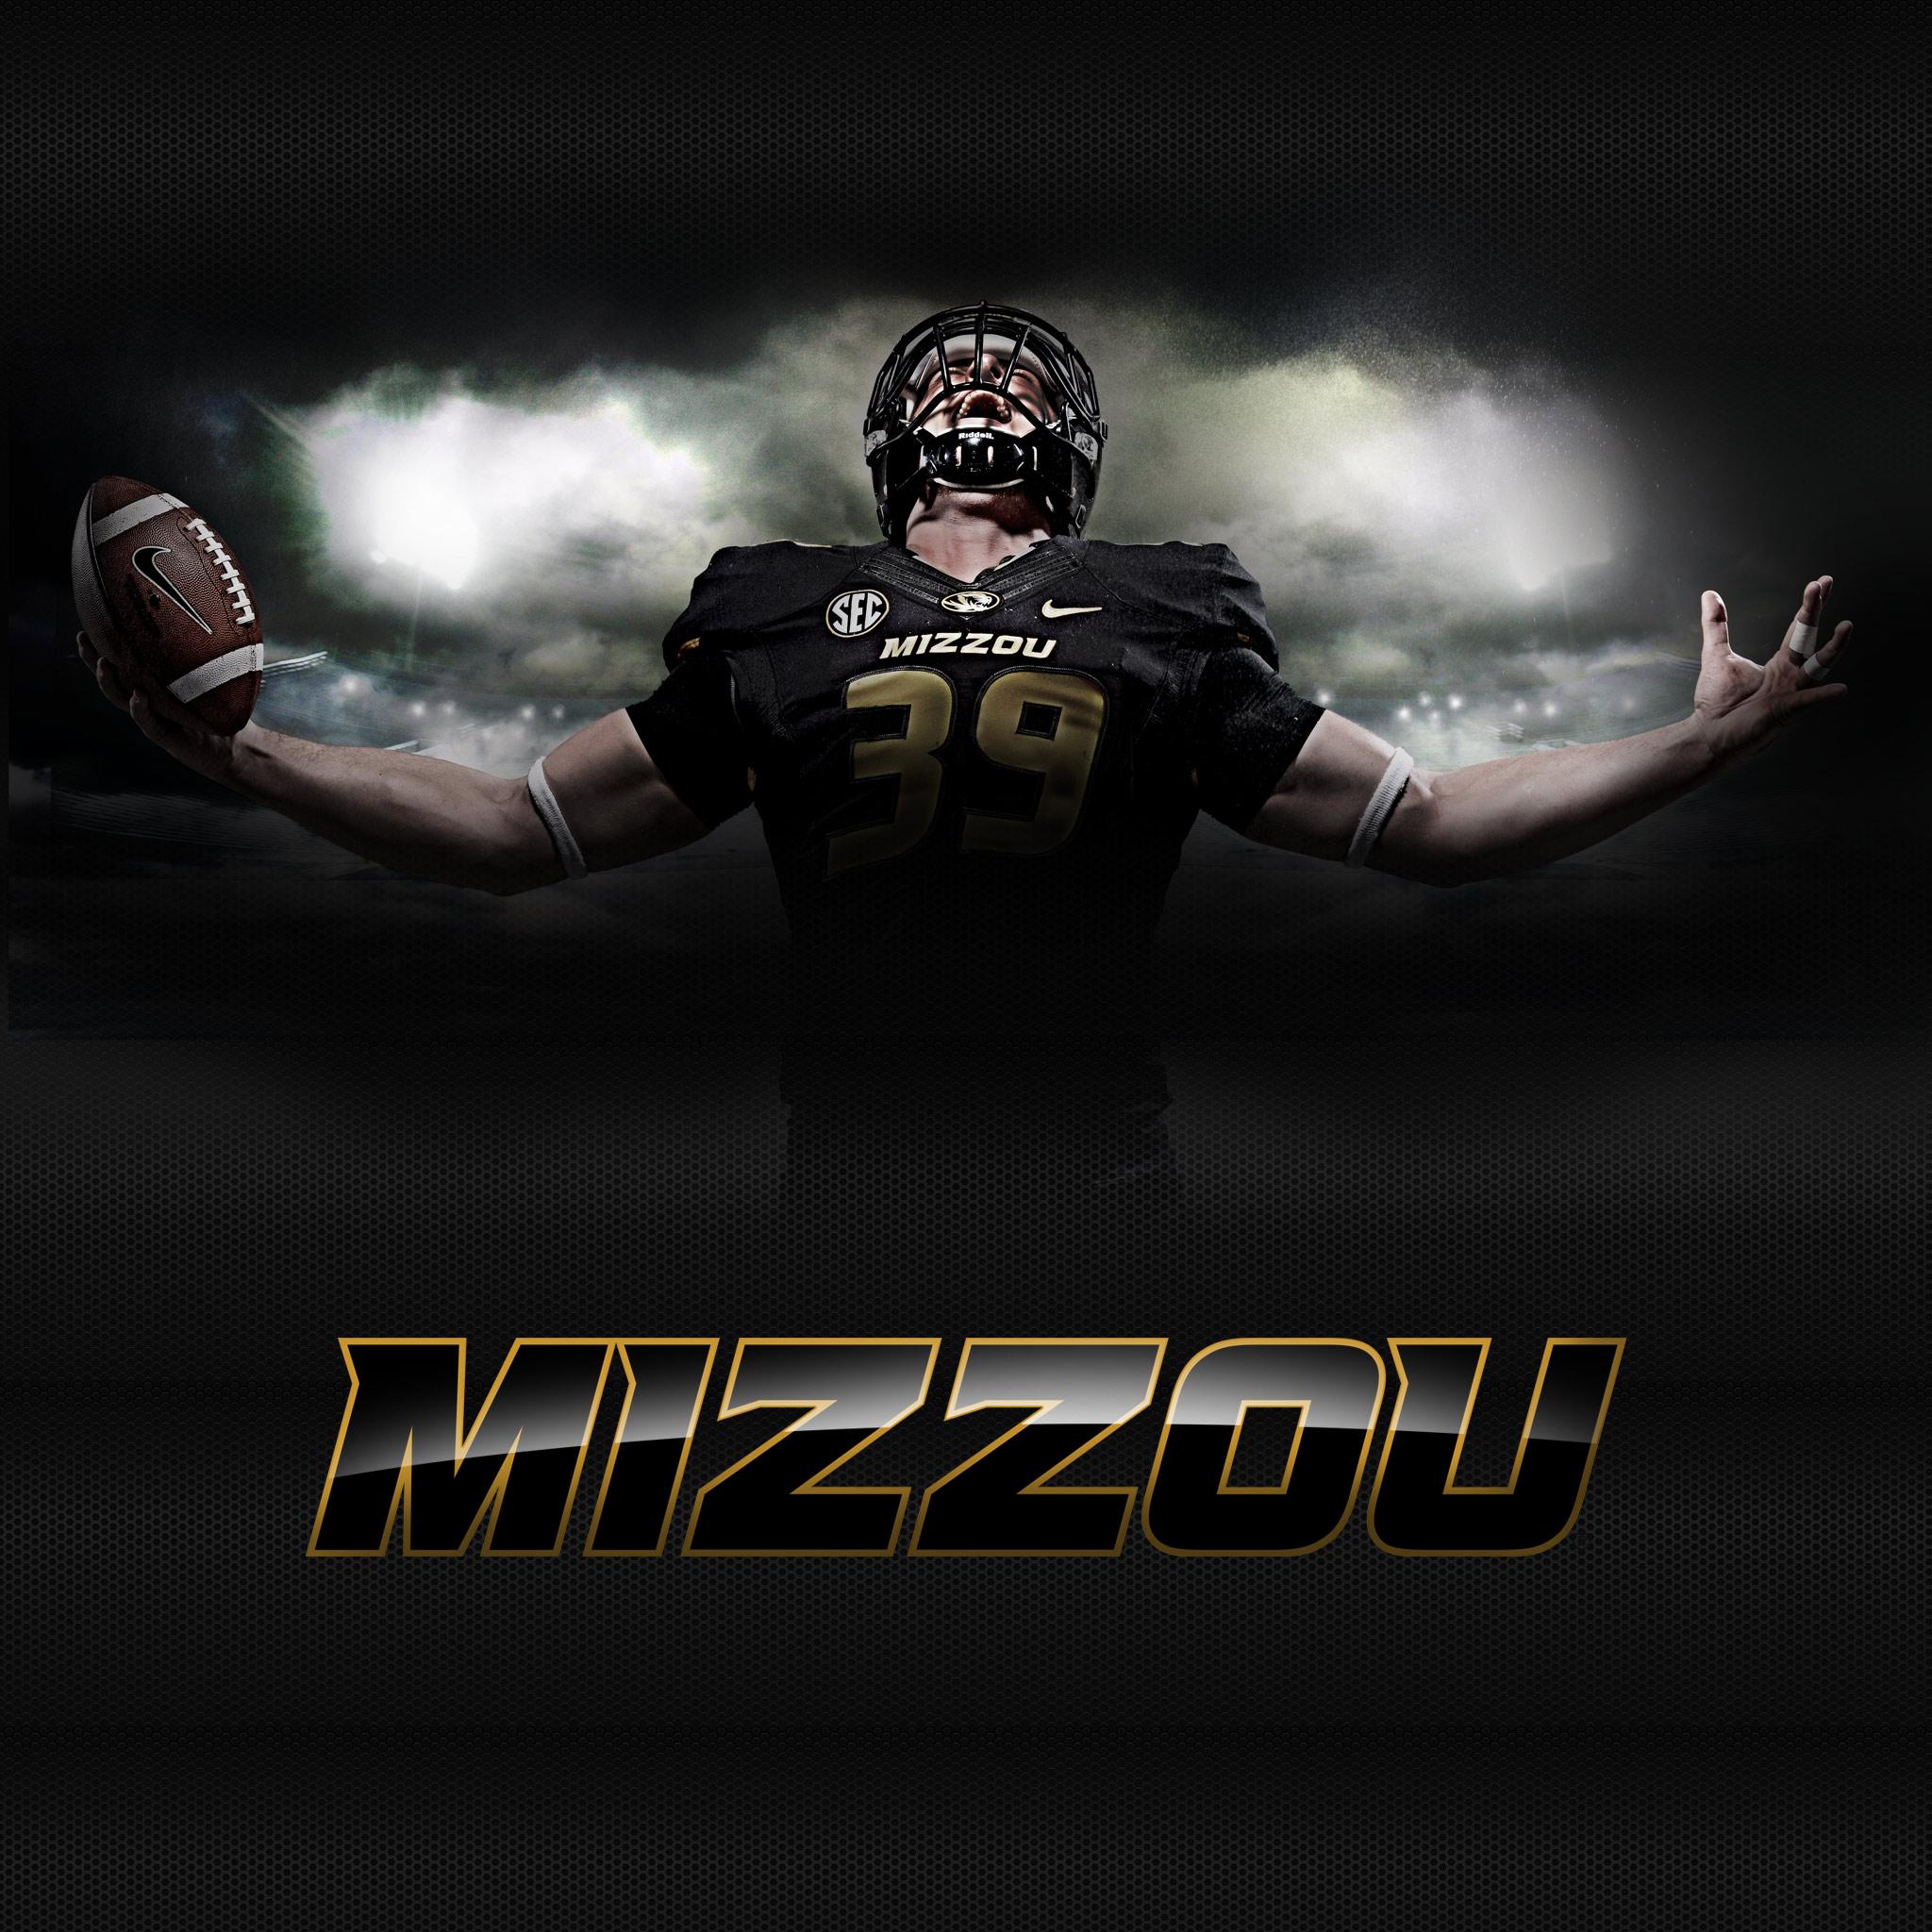 Wallpapers University Of Missouri Mizzou Tigers Ipad Wallpapers 2048x2048